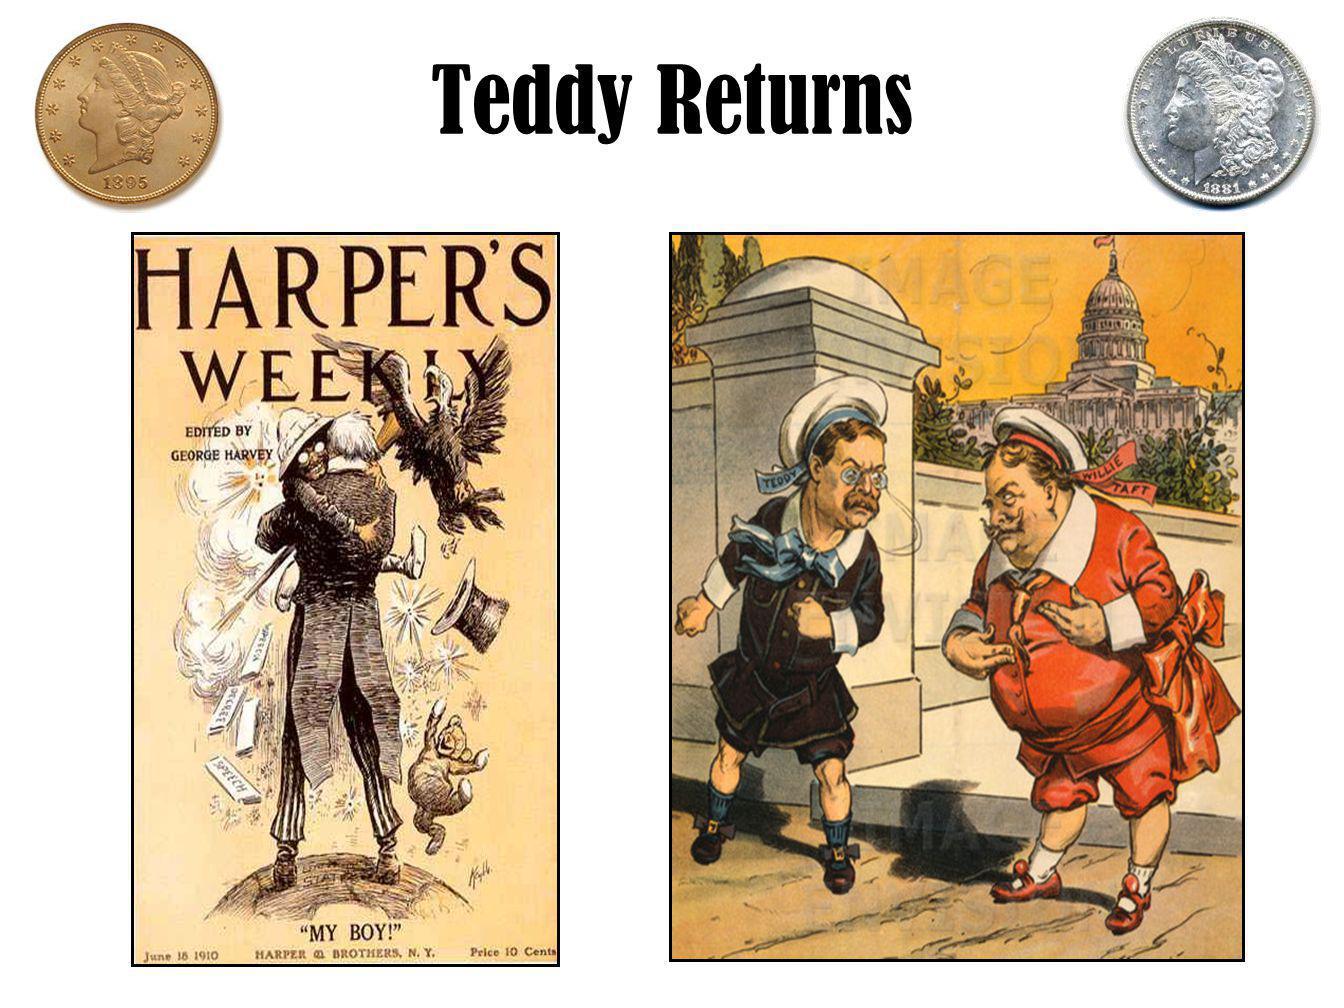 Teddy Returns